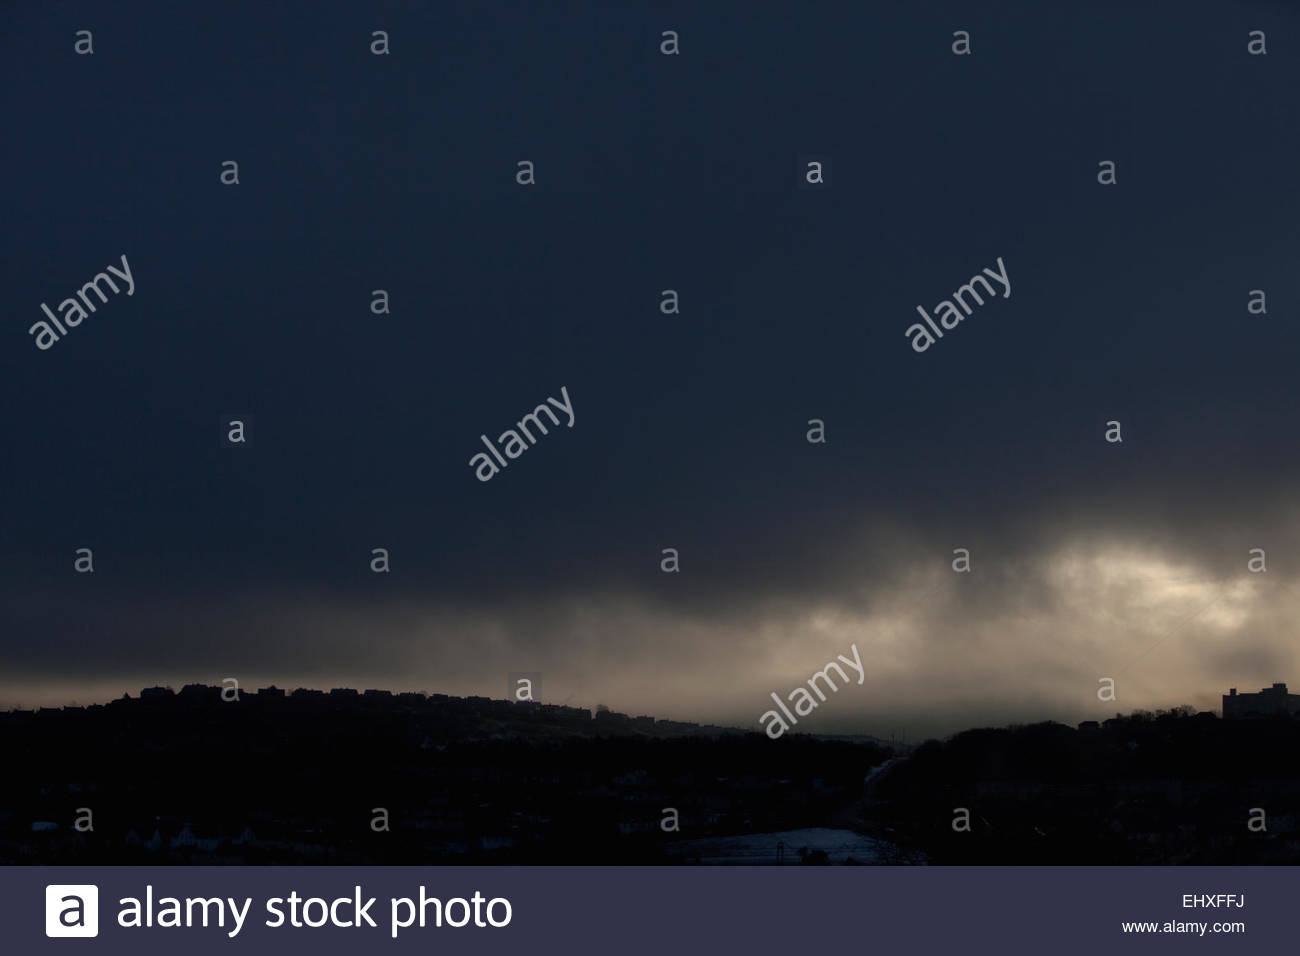 Silhouette row houses dark sky stormy overcast - Stock Image